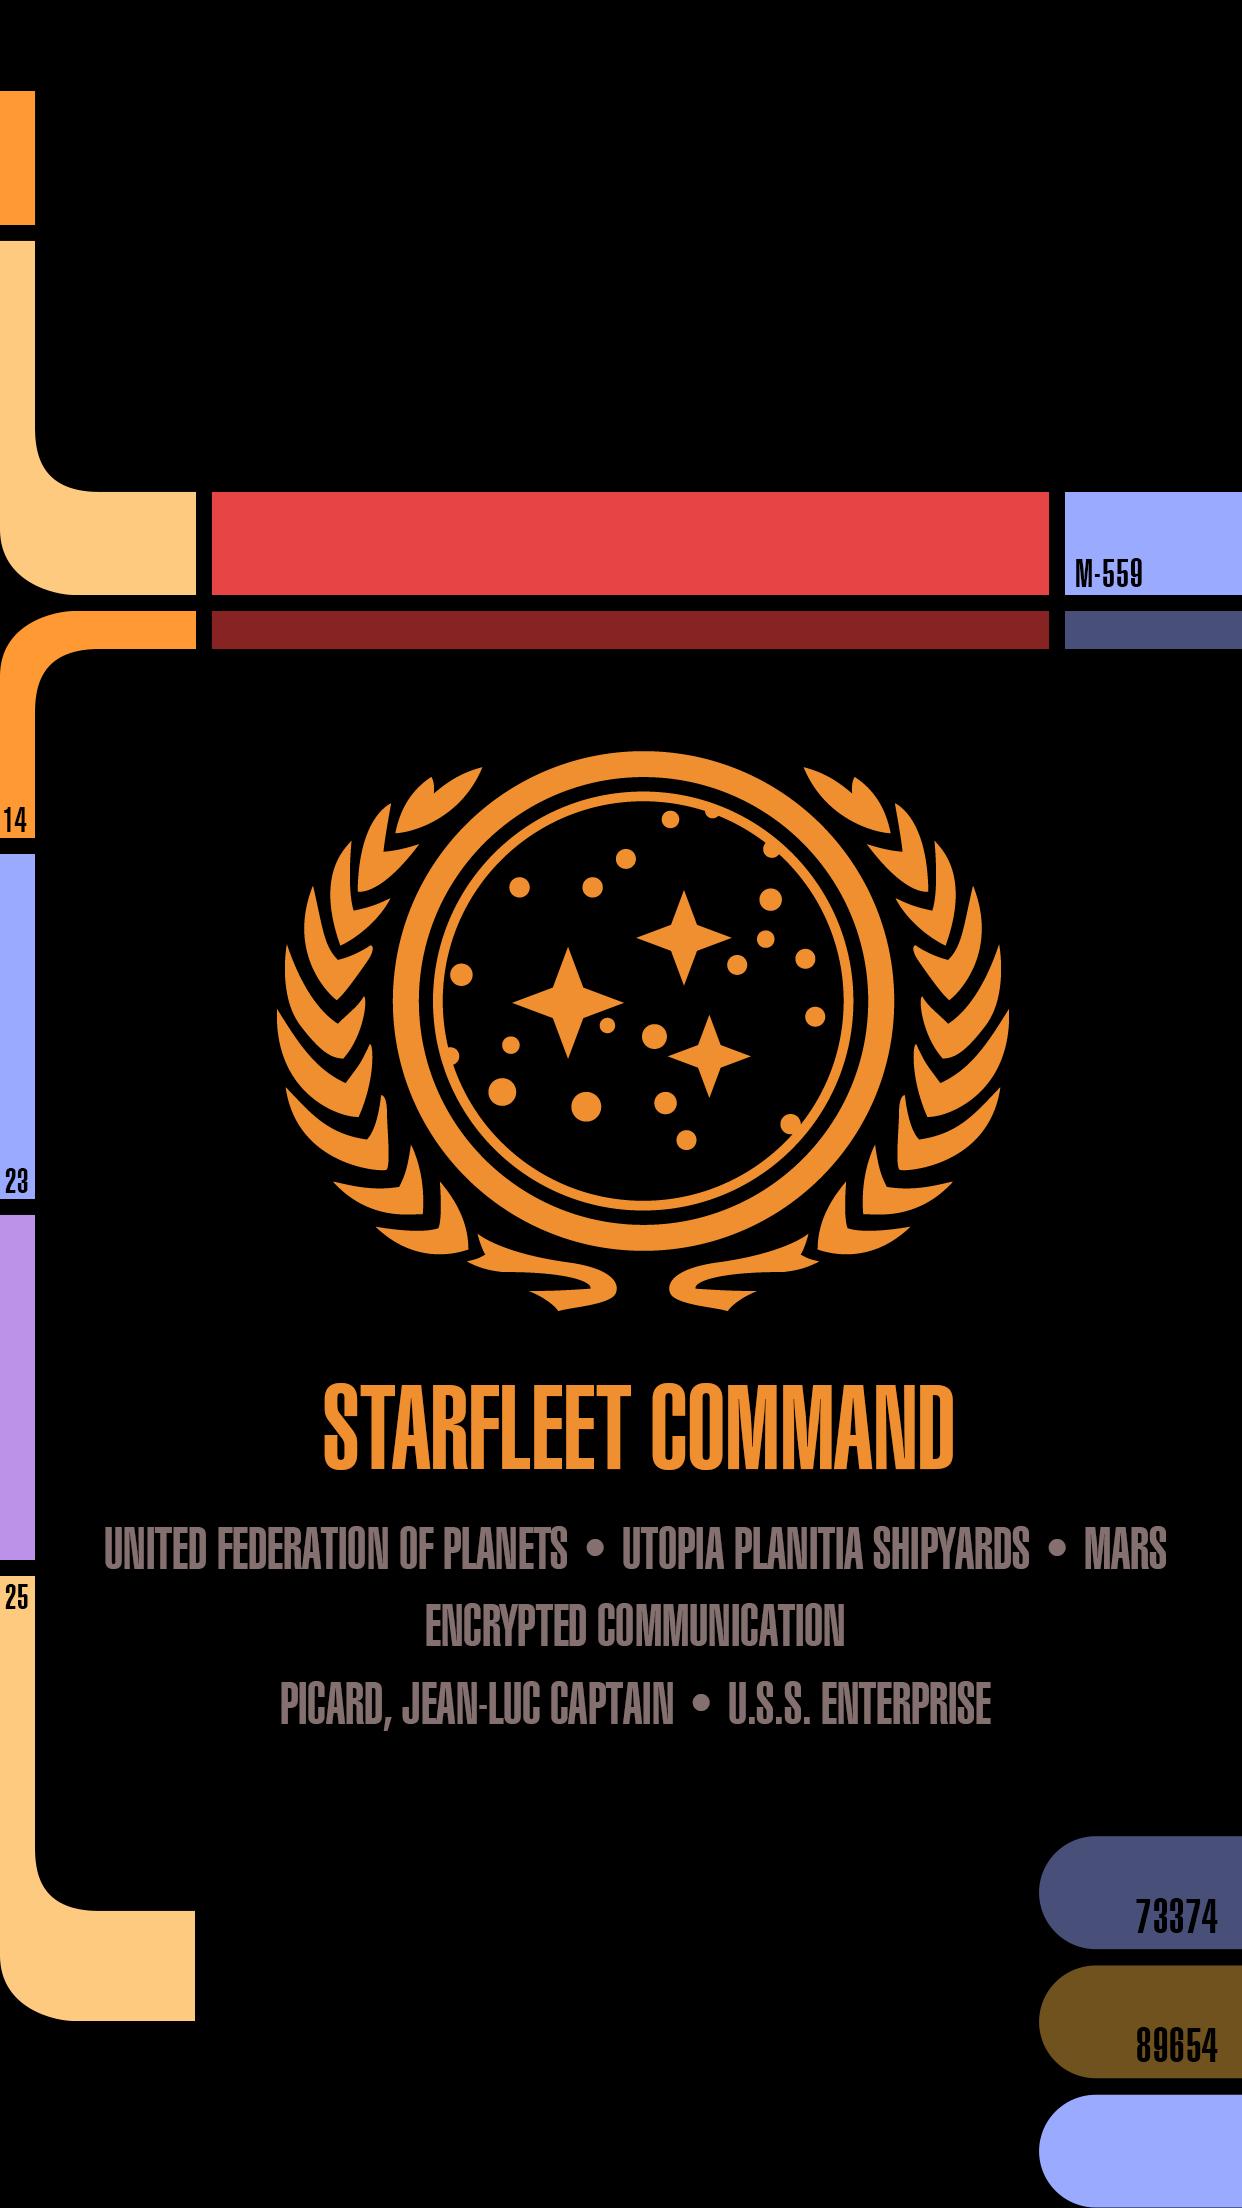 star trek starfleet command wallpaper - photo #12